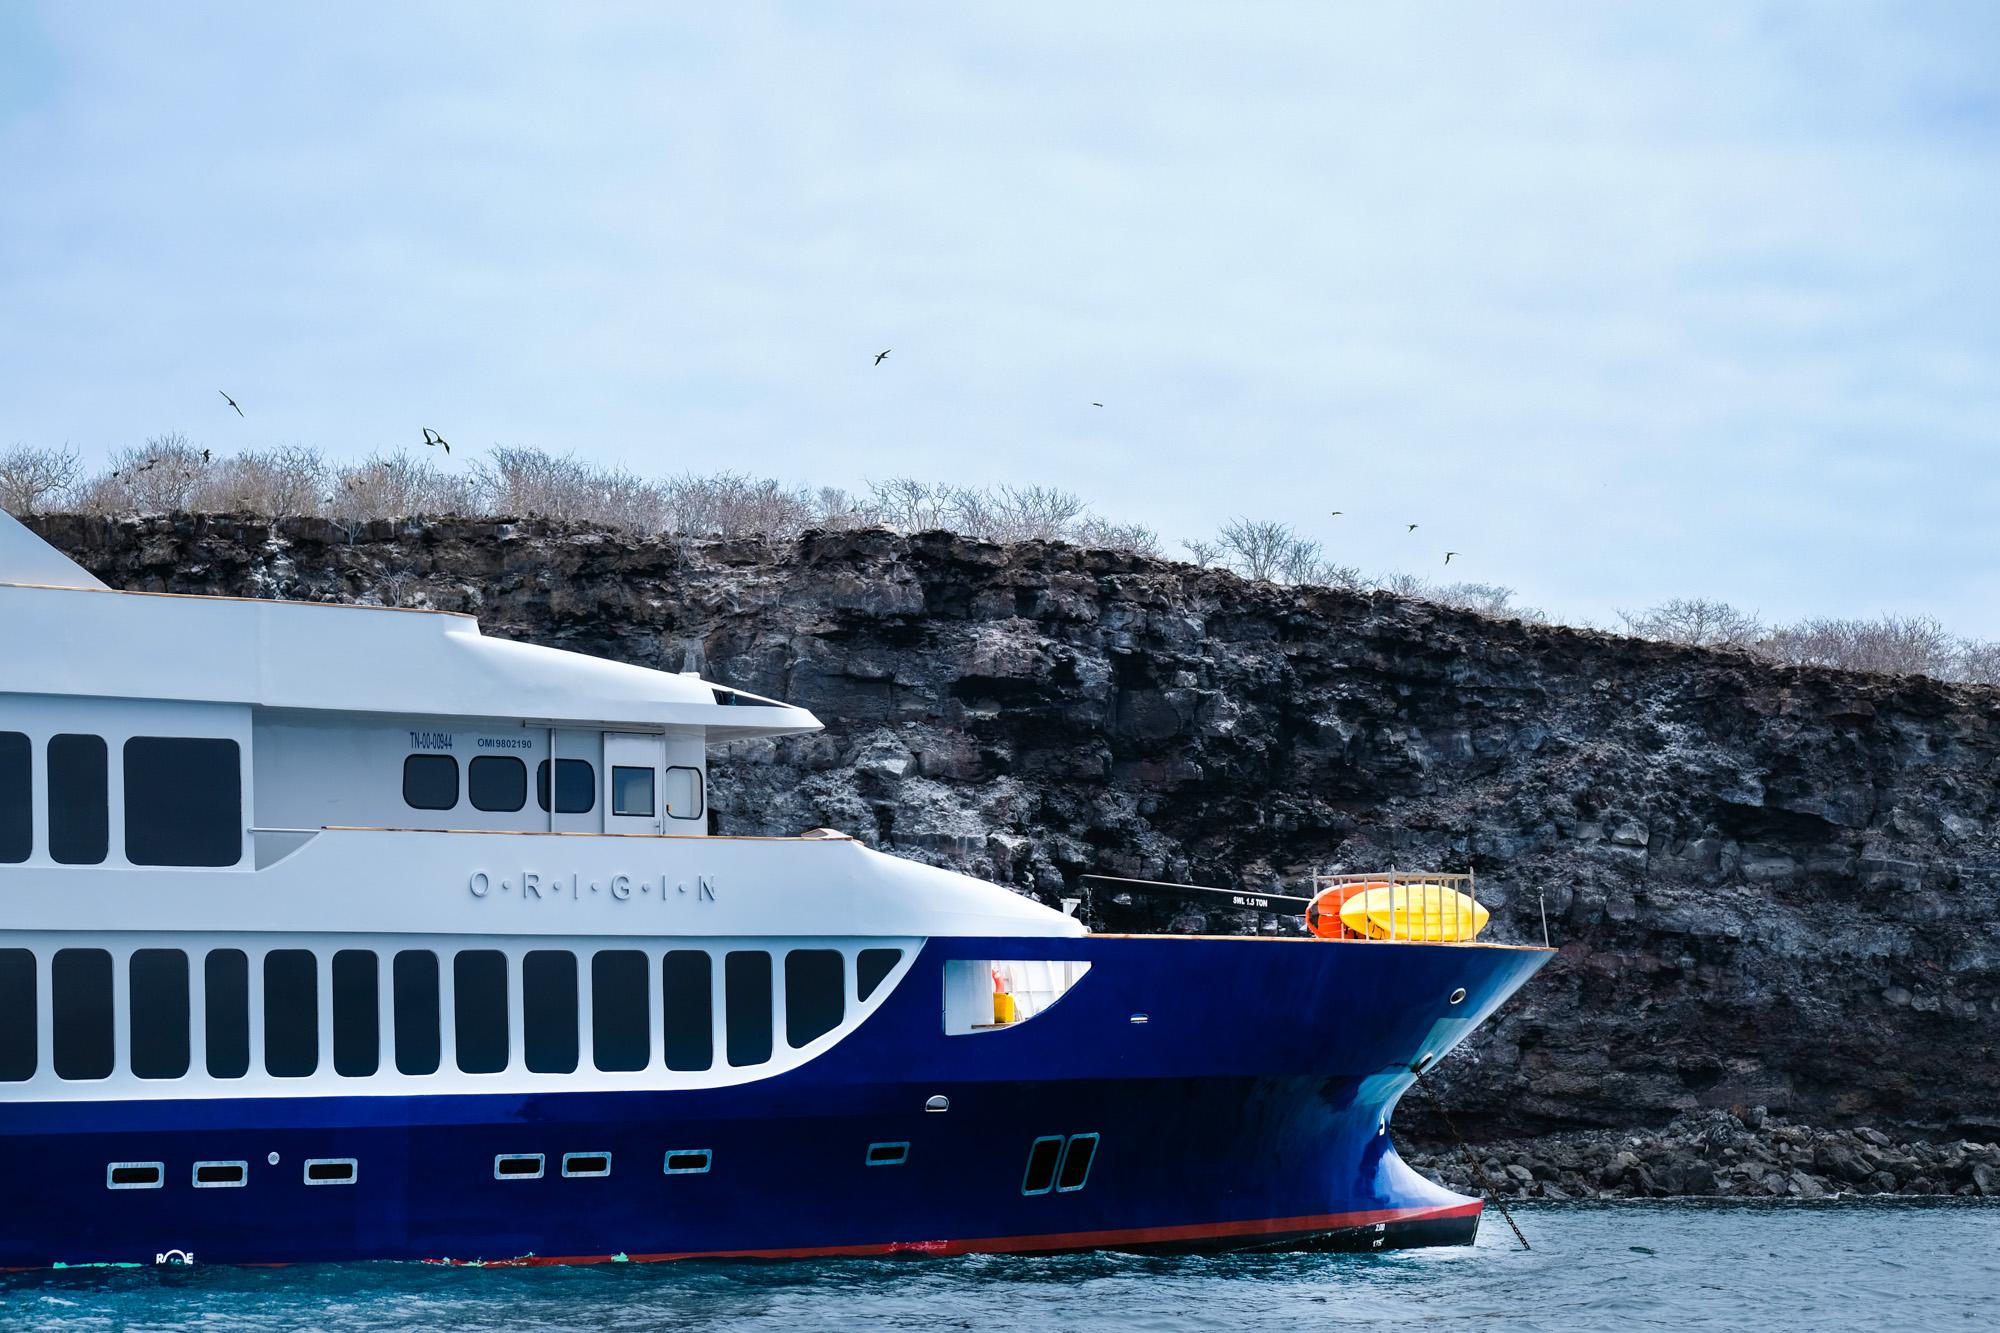 Ecoventura MV Origin